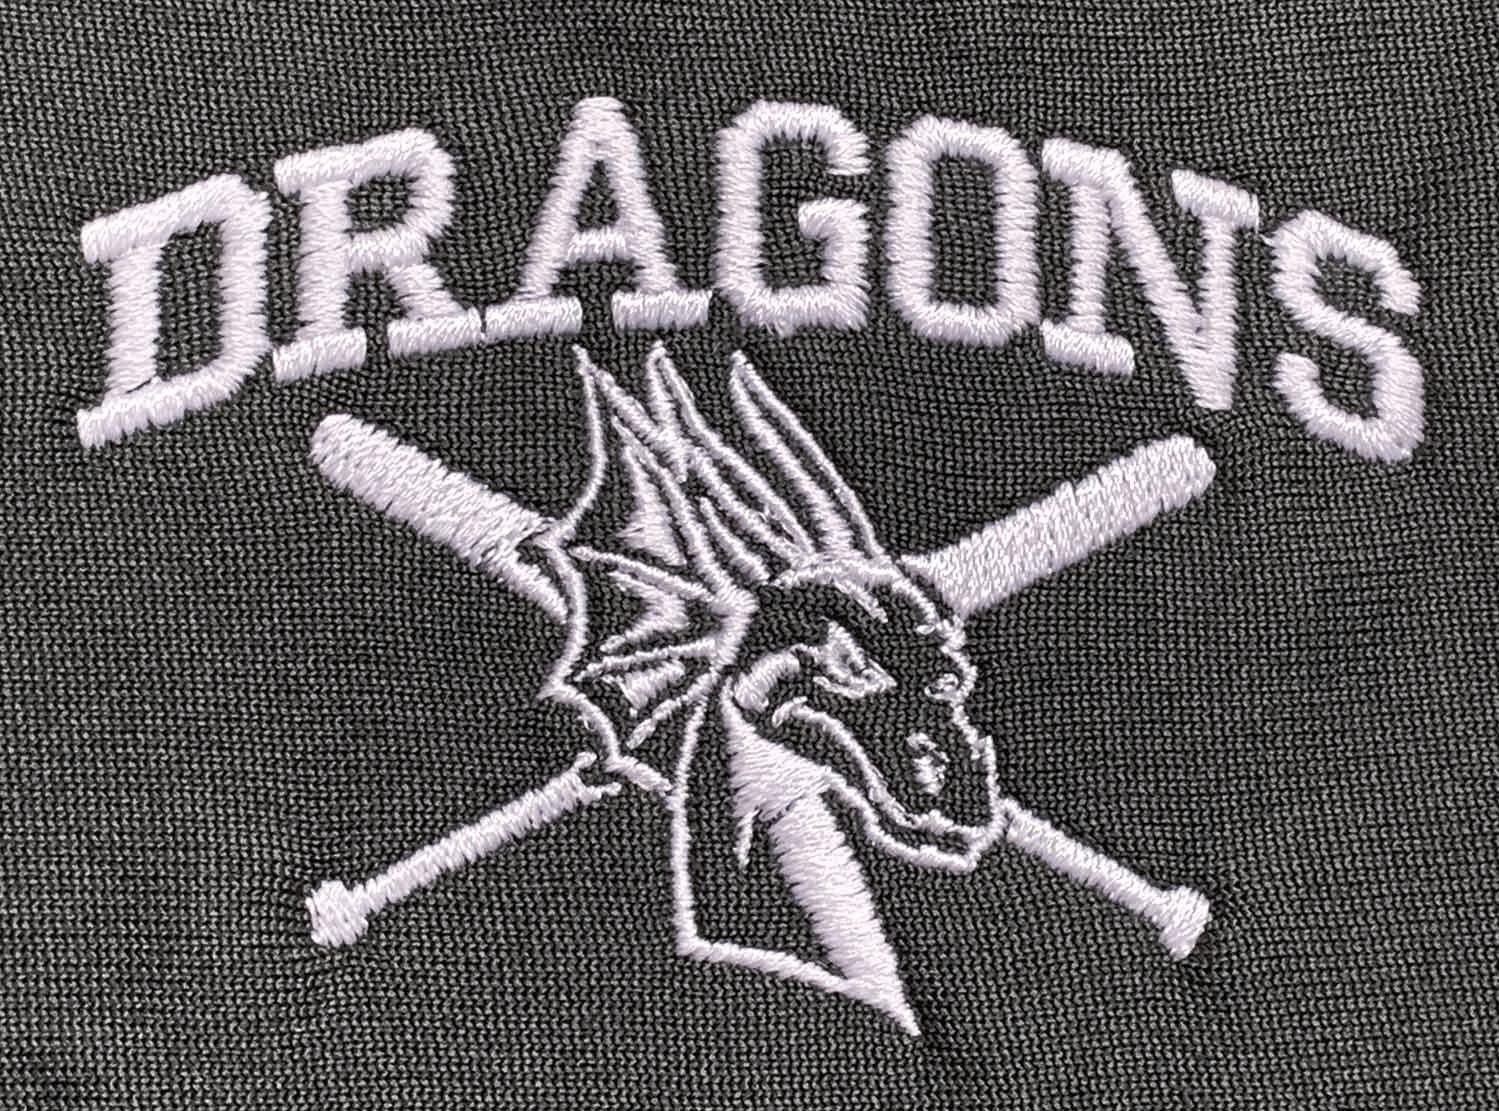 KYC_DRAGONS_web.jpg